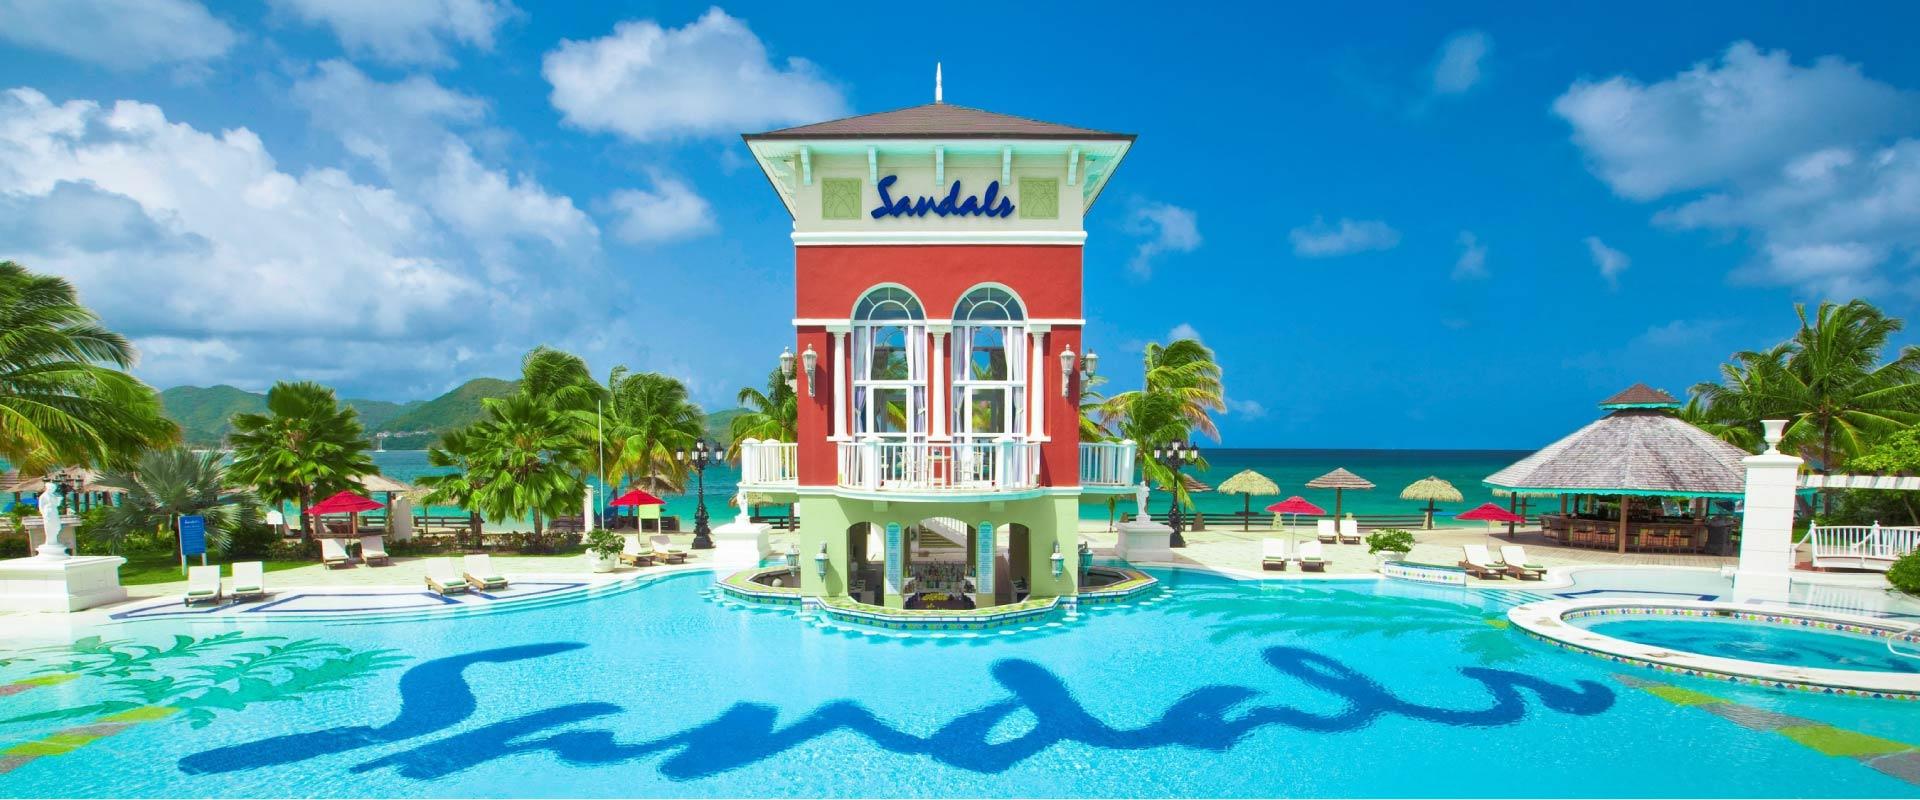 Quovadis - Sandals Resorts